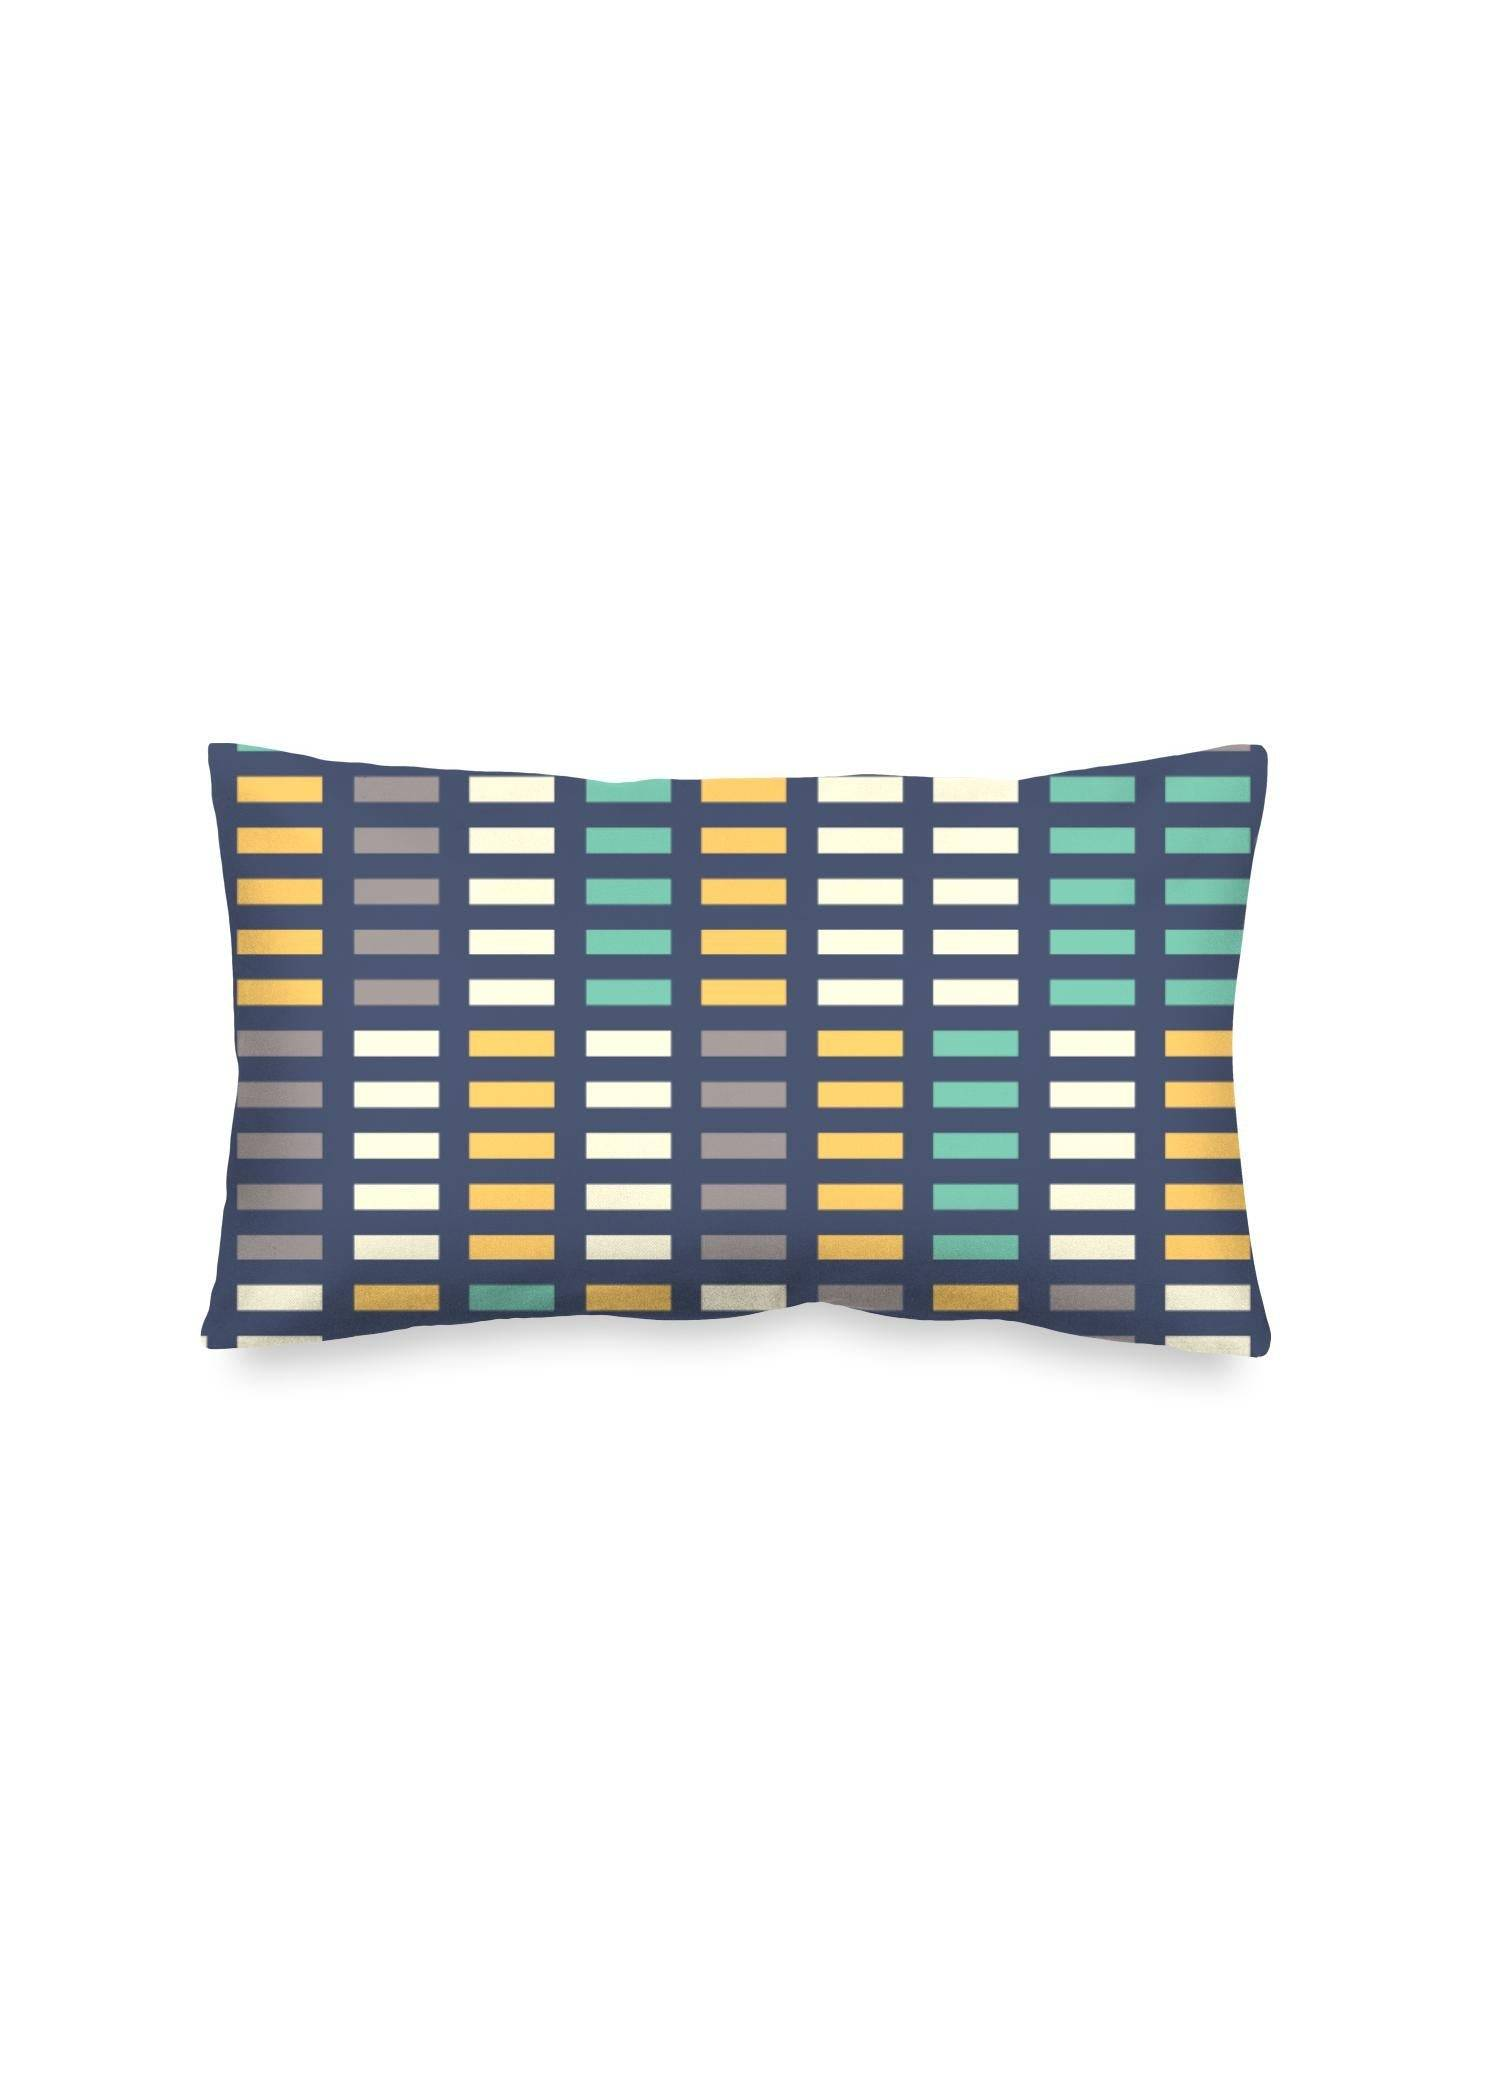 VIDA Oblong Pillow - Music Equalizer by VIDA Original Artist  - Size: Matte